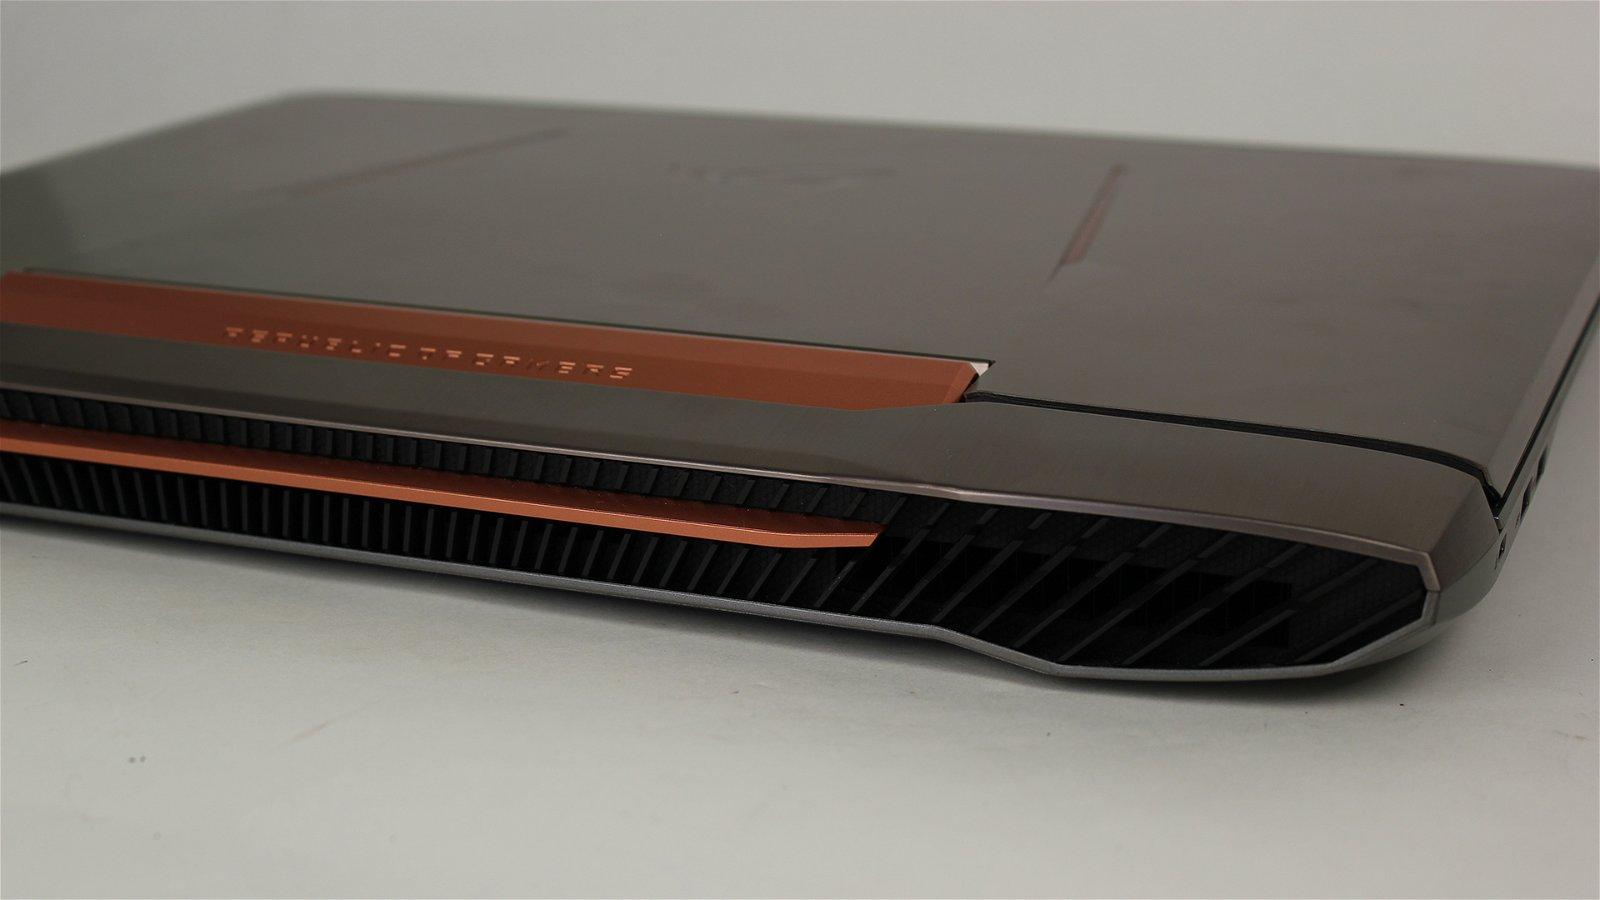 Asus Rog G752Vt-Dh72 (Laptop) Review 3